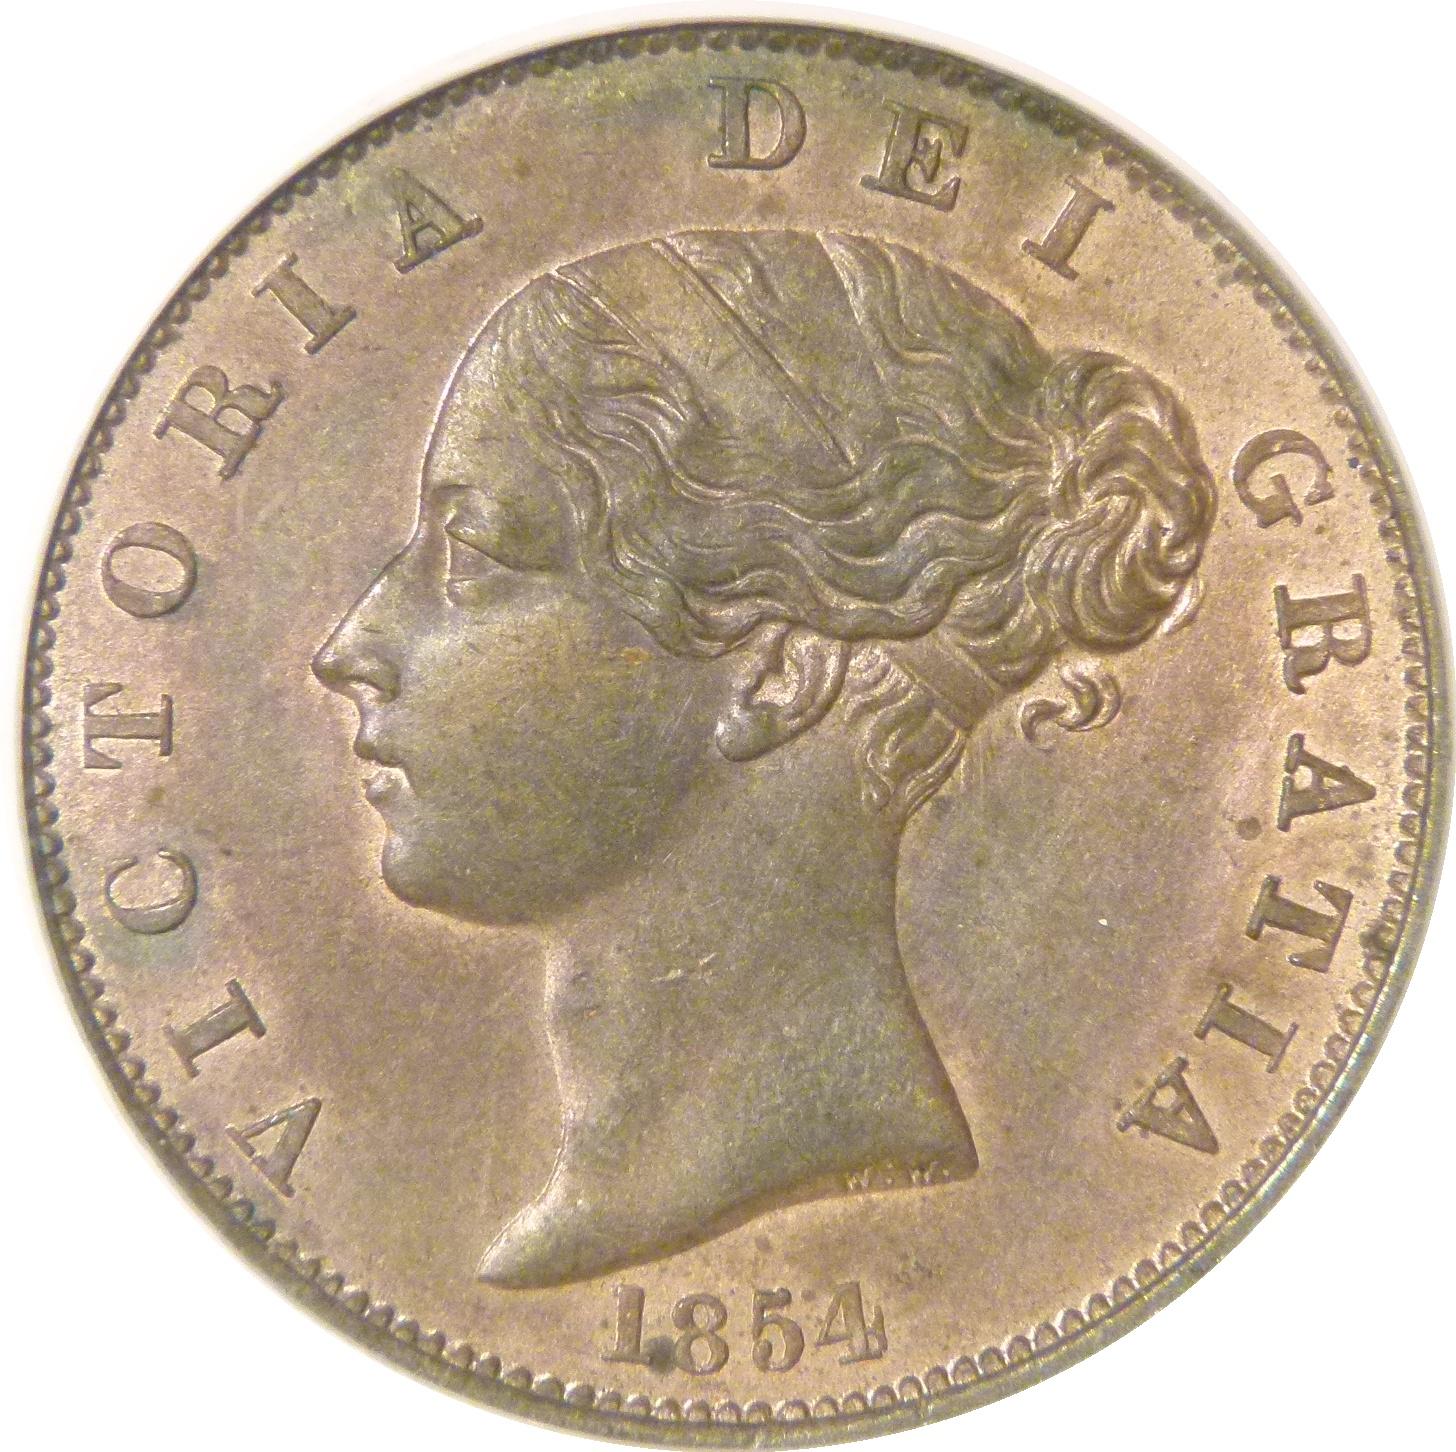 1854 Halfpenny, CGS 78(MS 63-64), UNC, Victoria, Peck 1542, UIN 13106